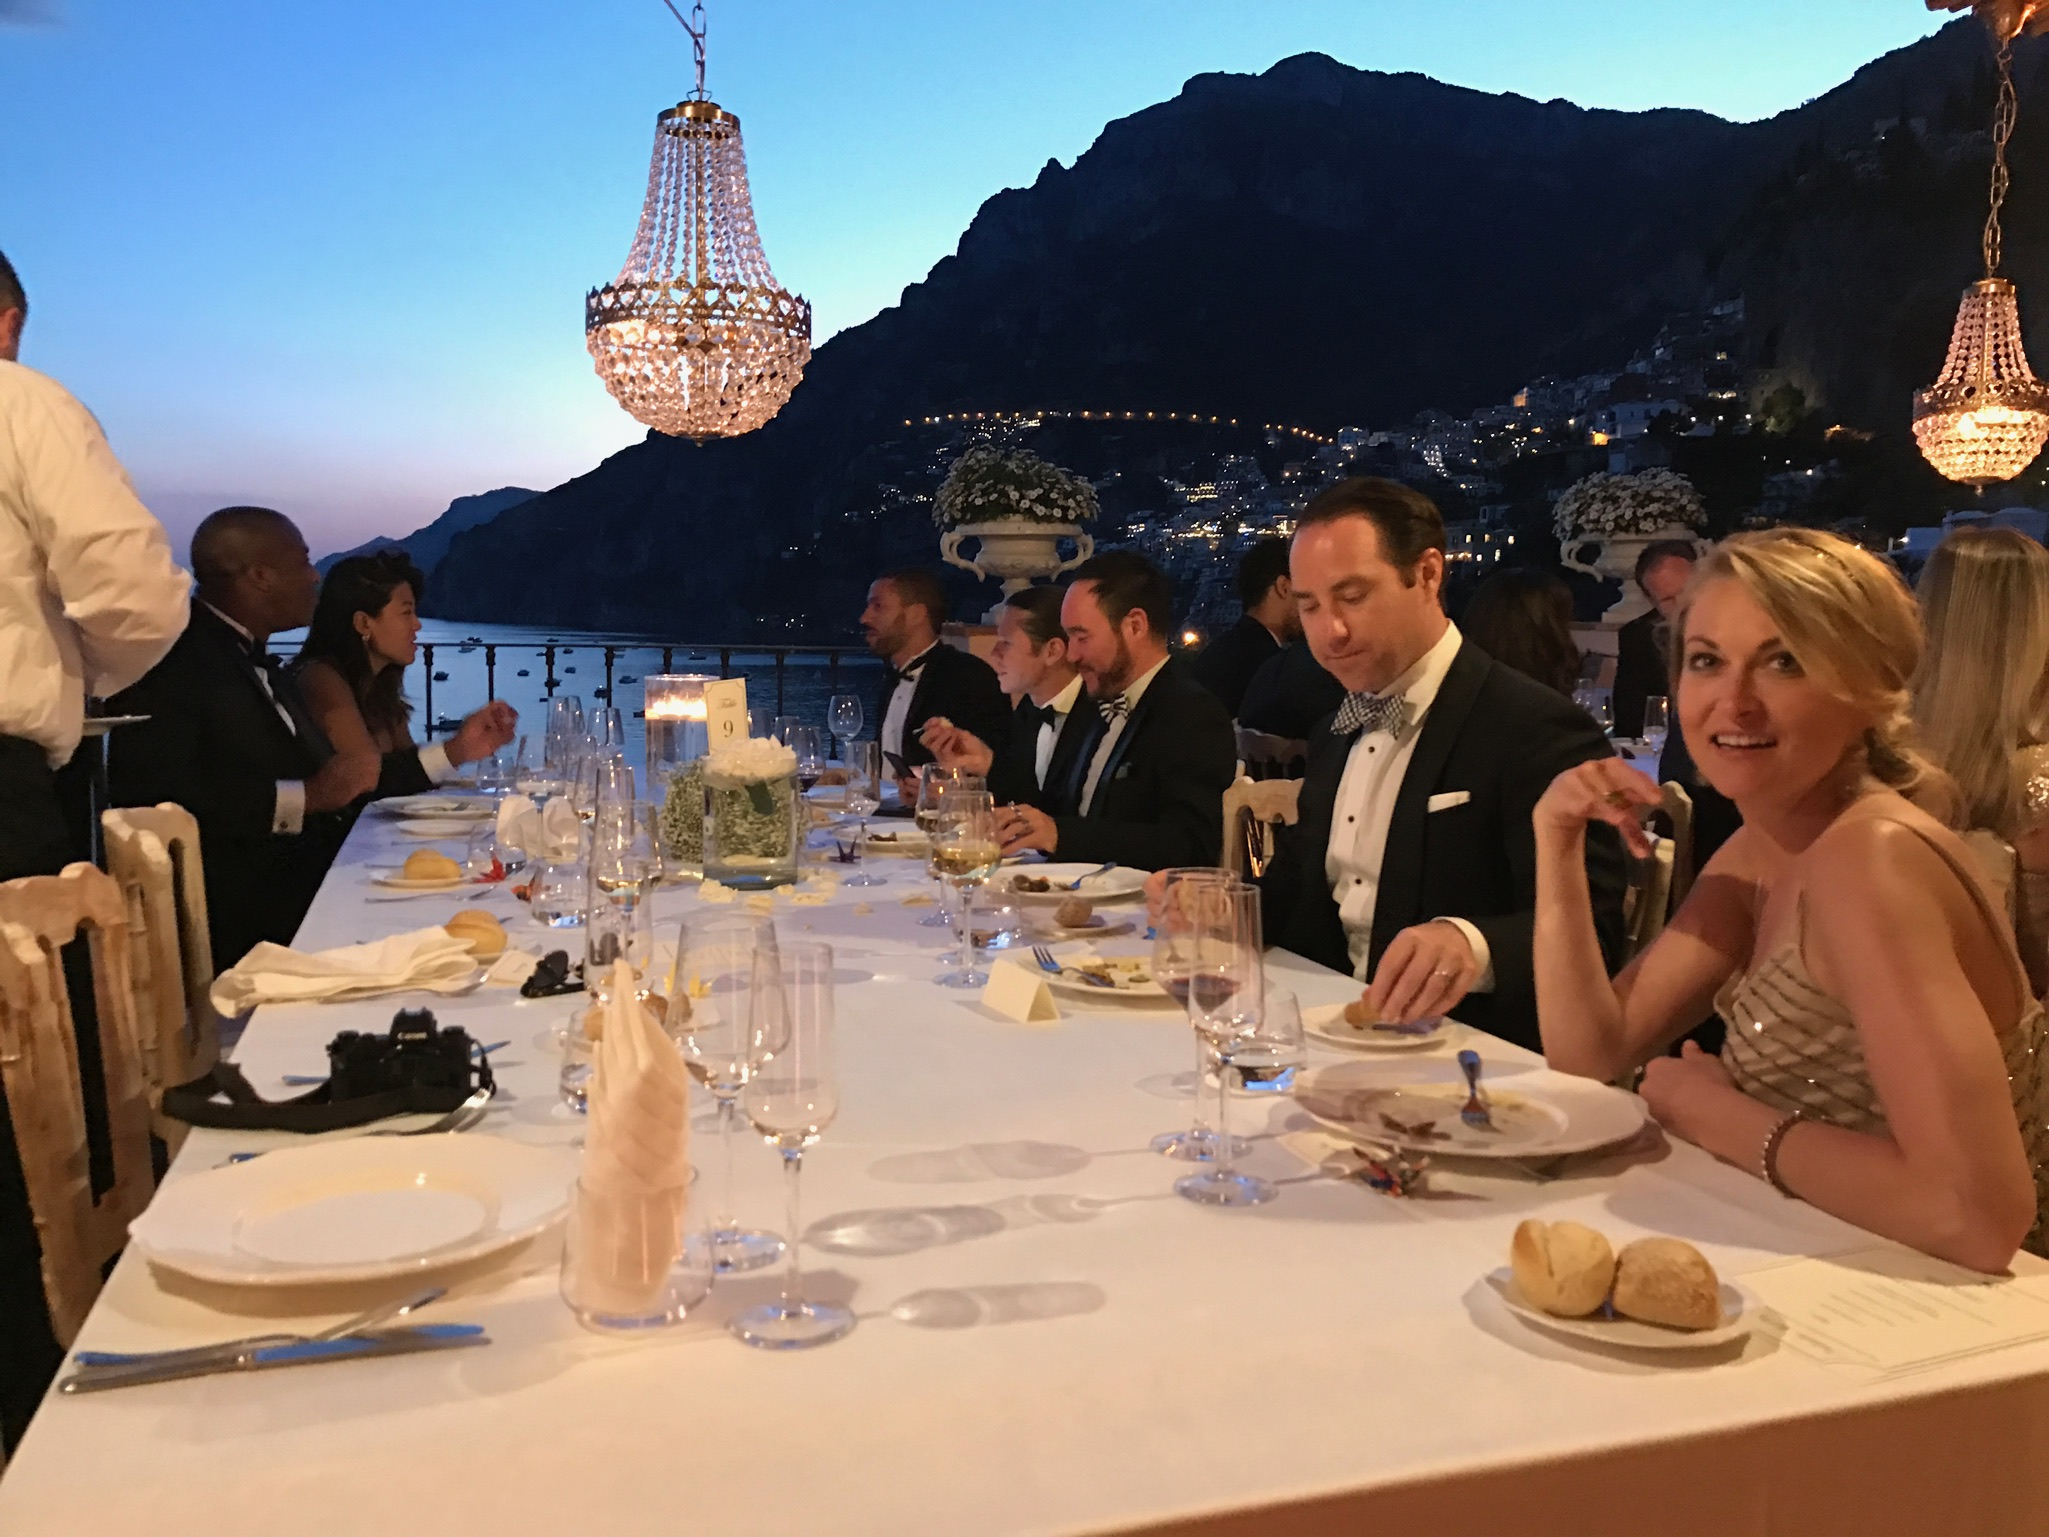 http://www.weddingamalfi.com/wp-content/uploads/Nathalie-and-Benjamin-Wedding-in-Positano-Italy-14.jpg